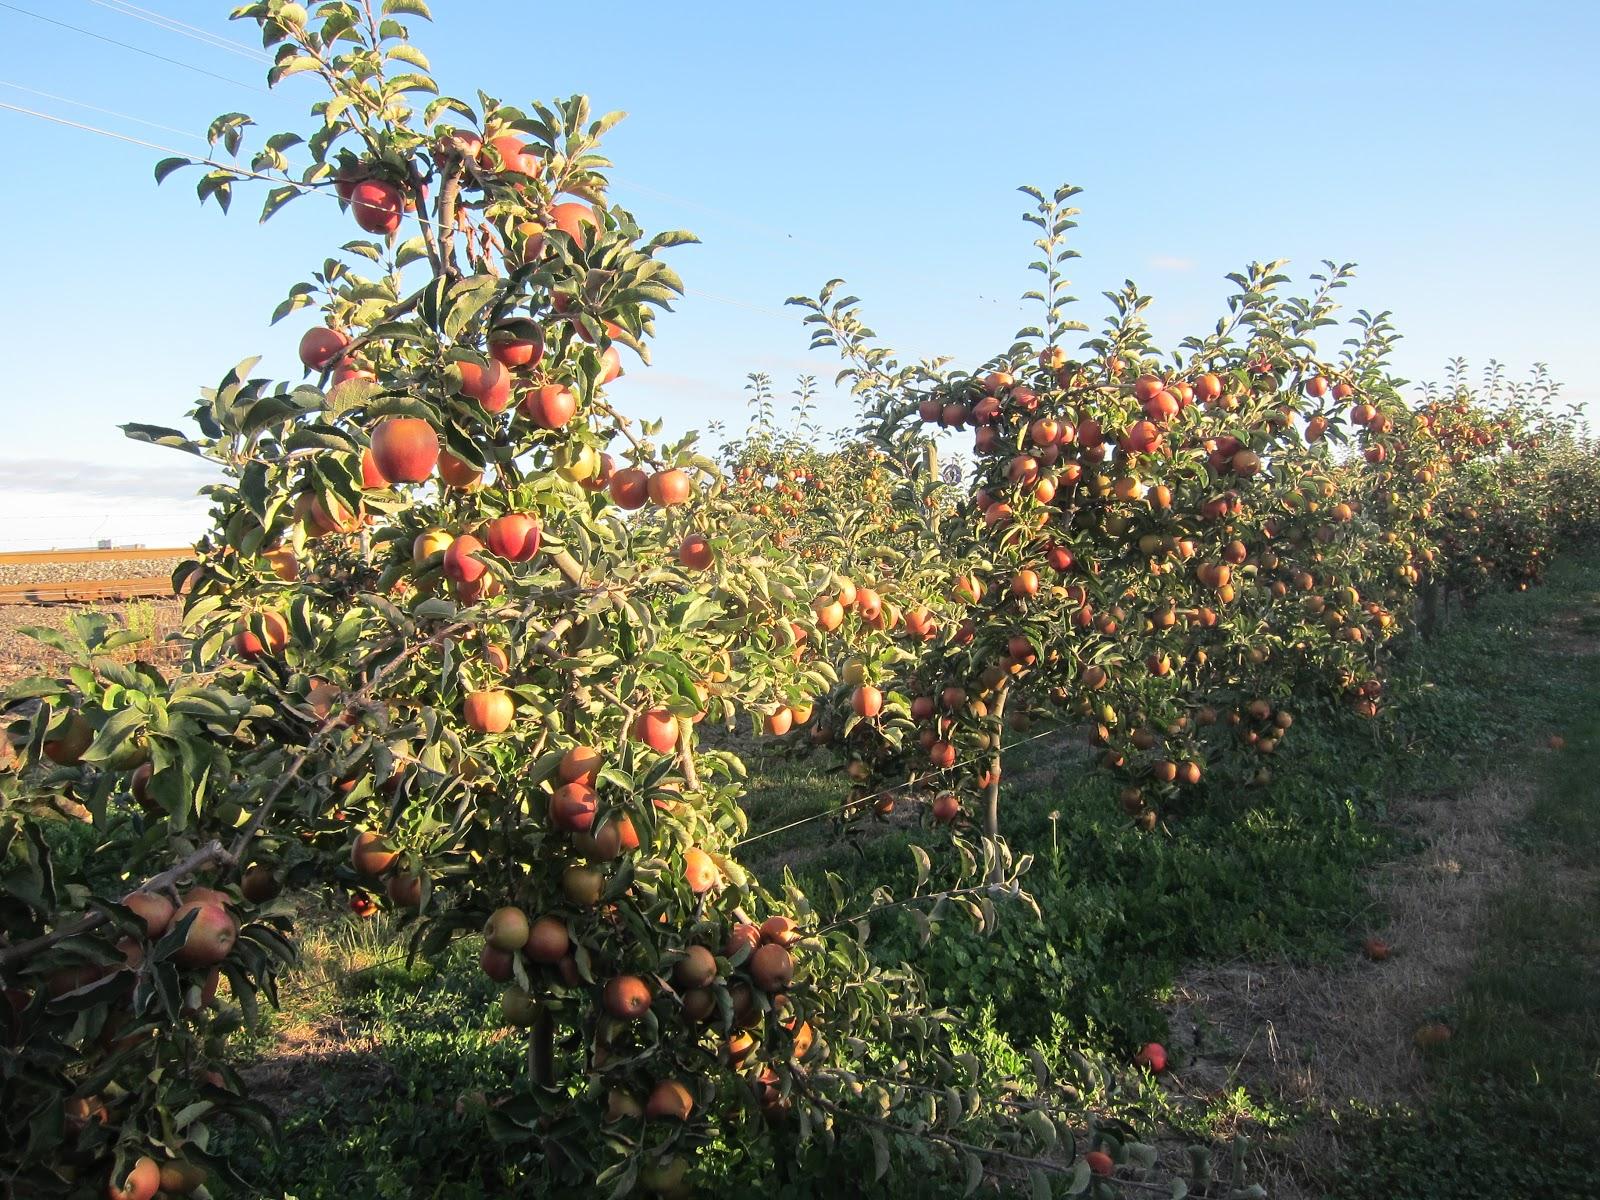 Beilke Family Farm Oregon Apples U Pick From The Farm